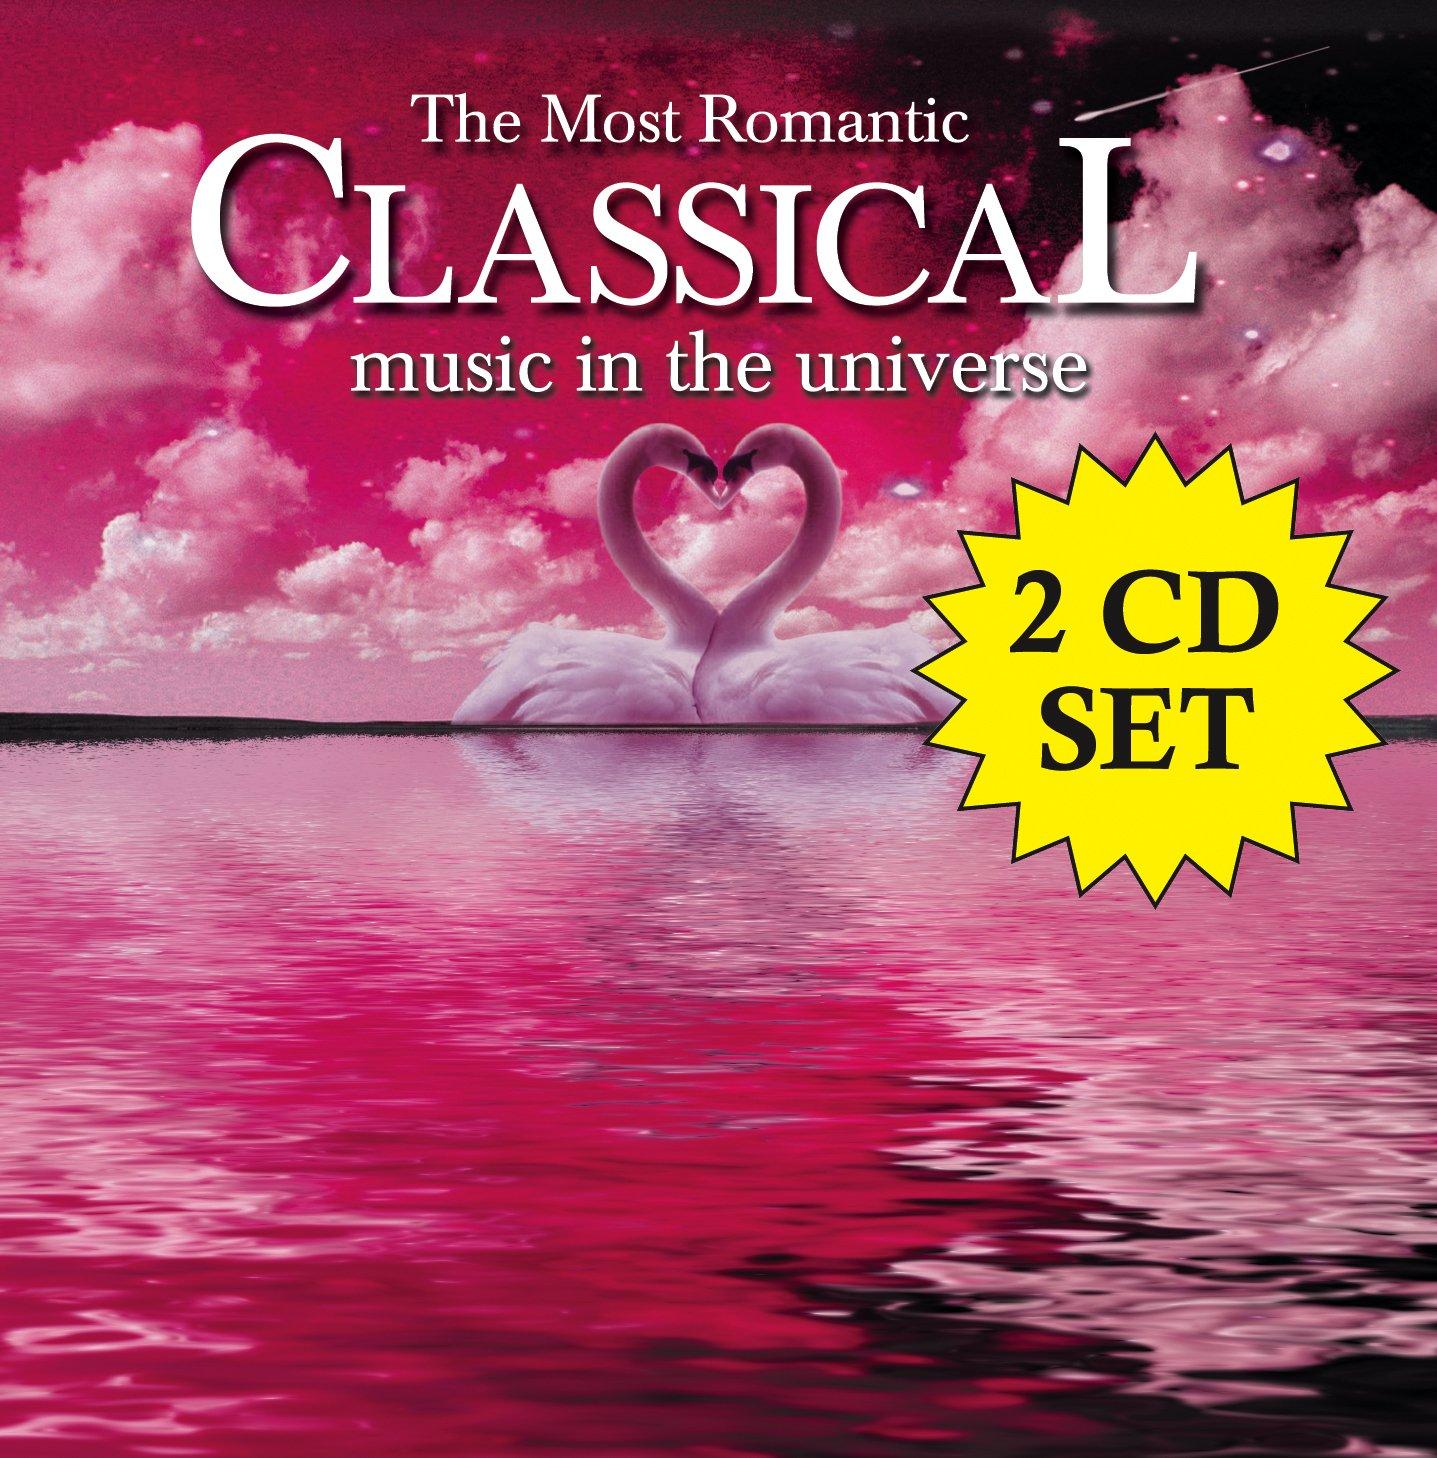 The most romantic music